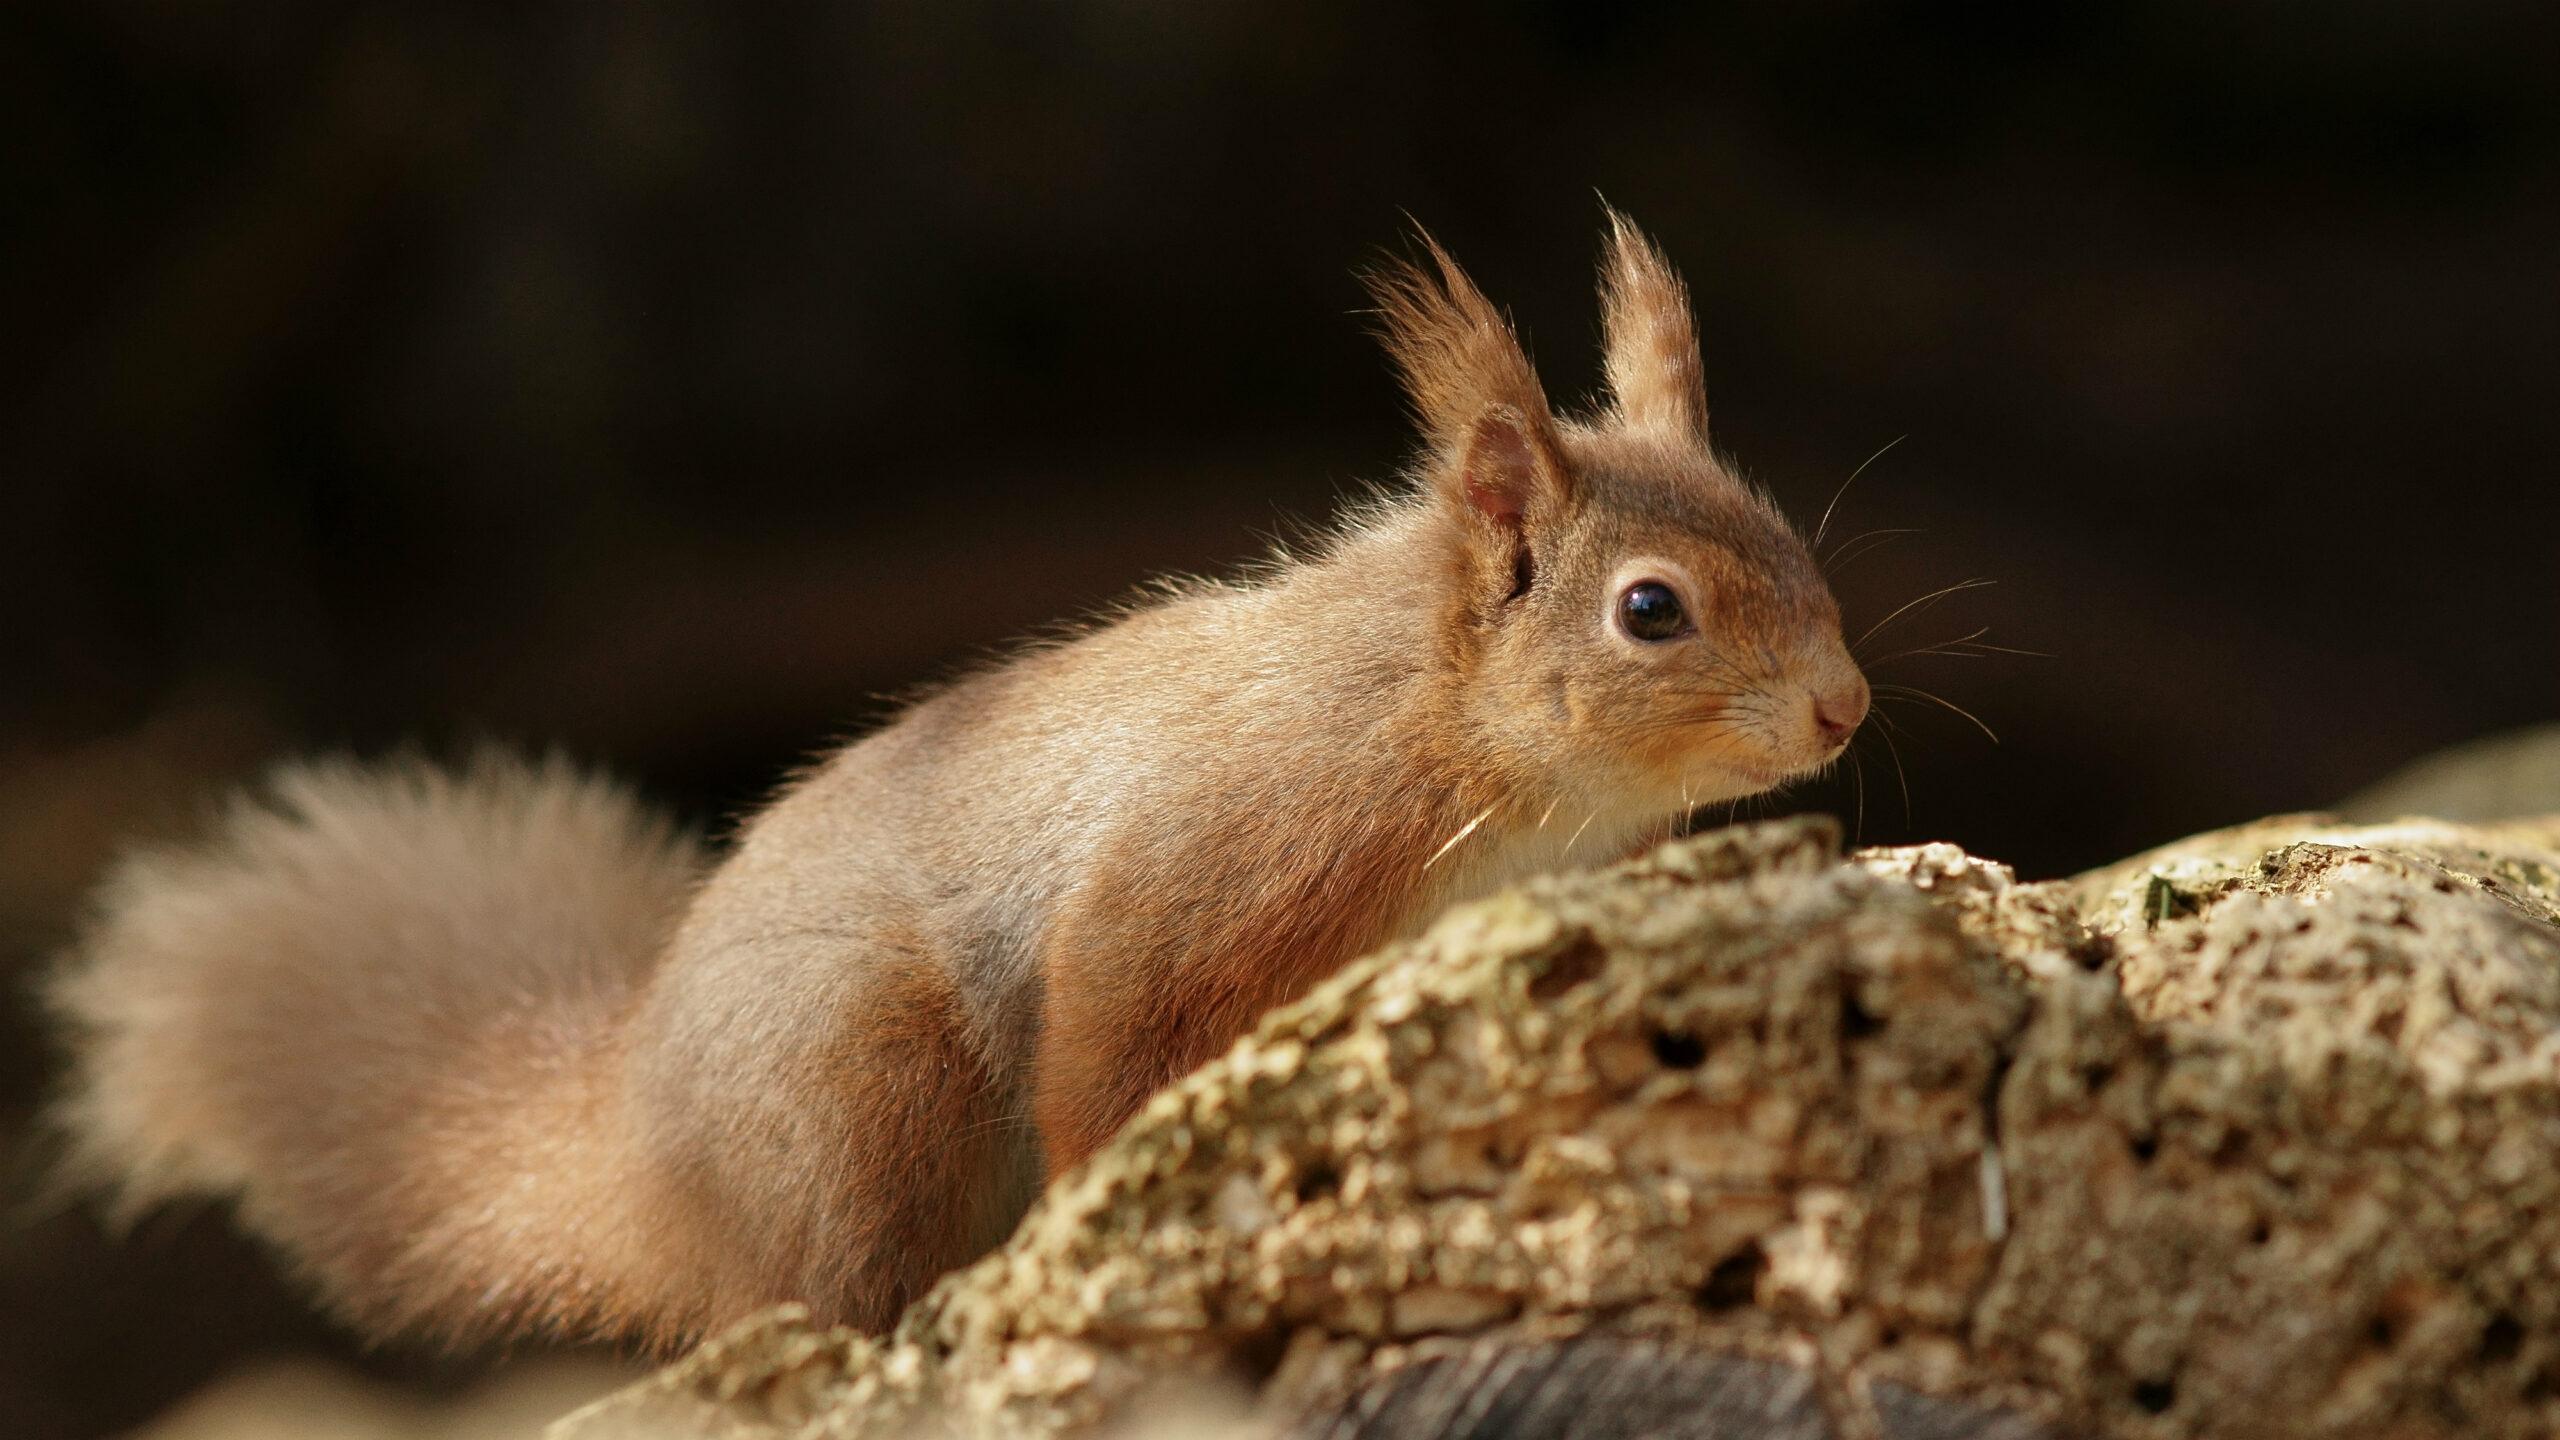 Brownsea Island Squirrel | Brownsea Island